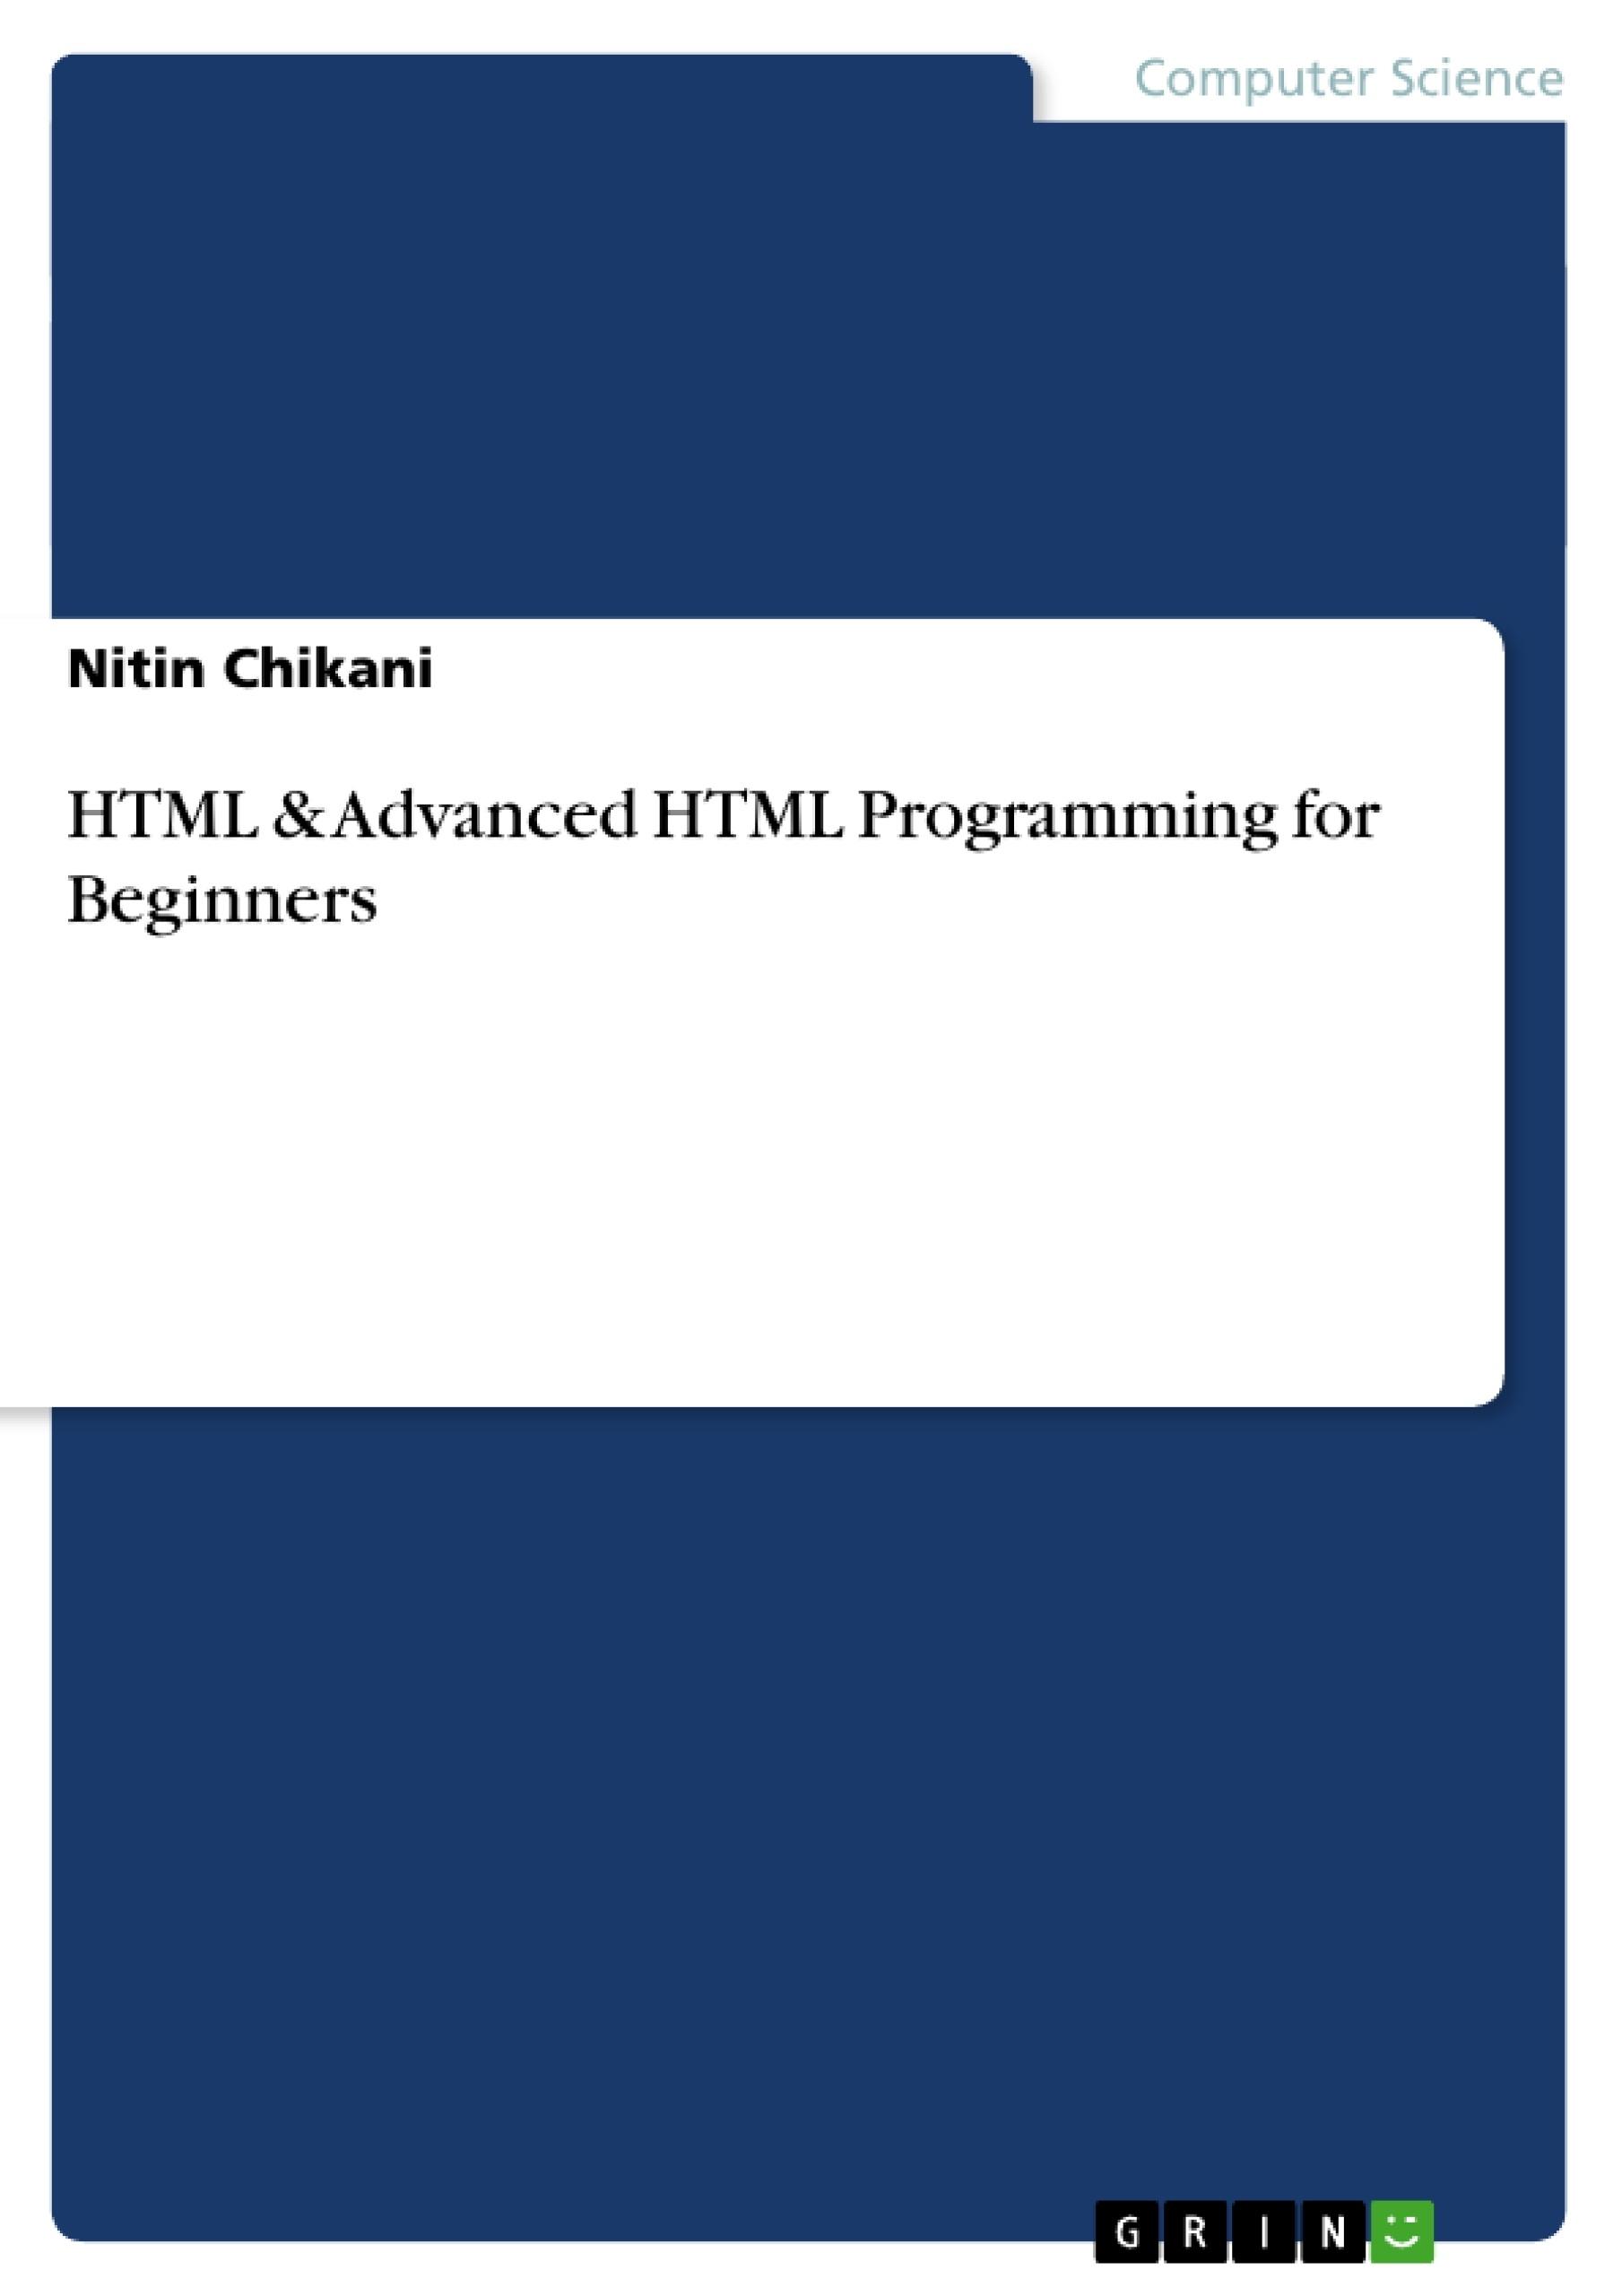 Title: HTML & Advanced HTML Programming for Beginners